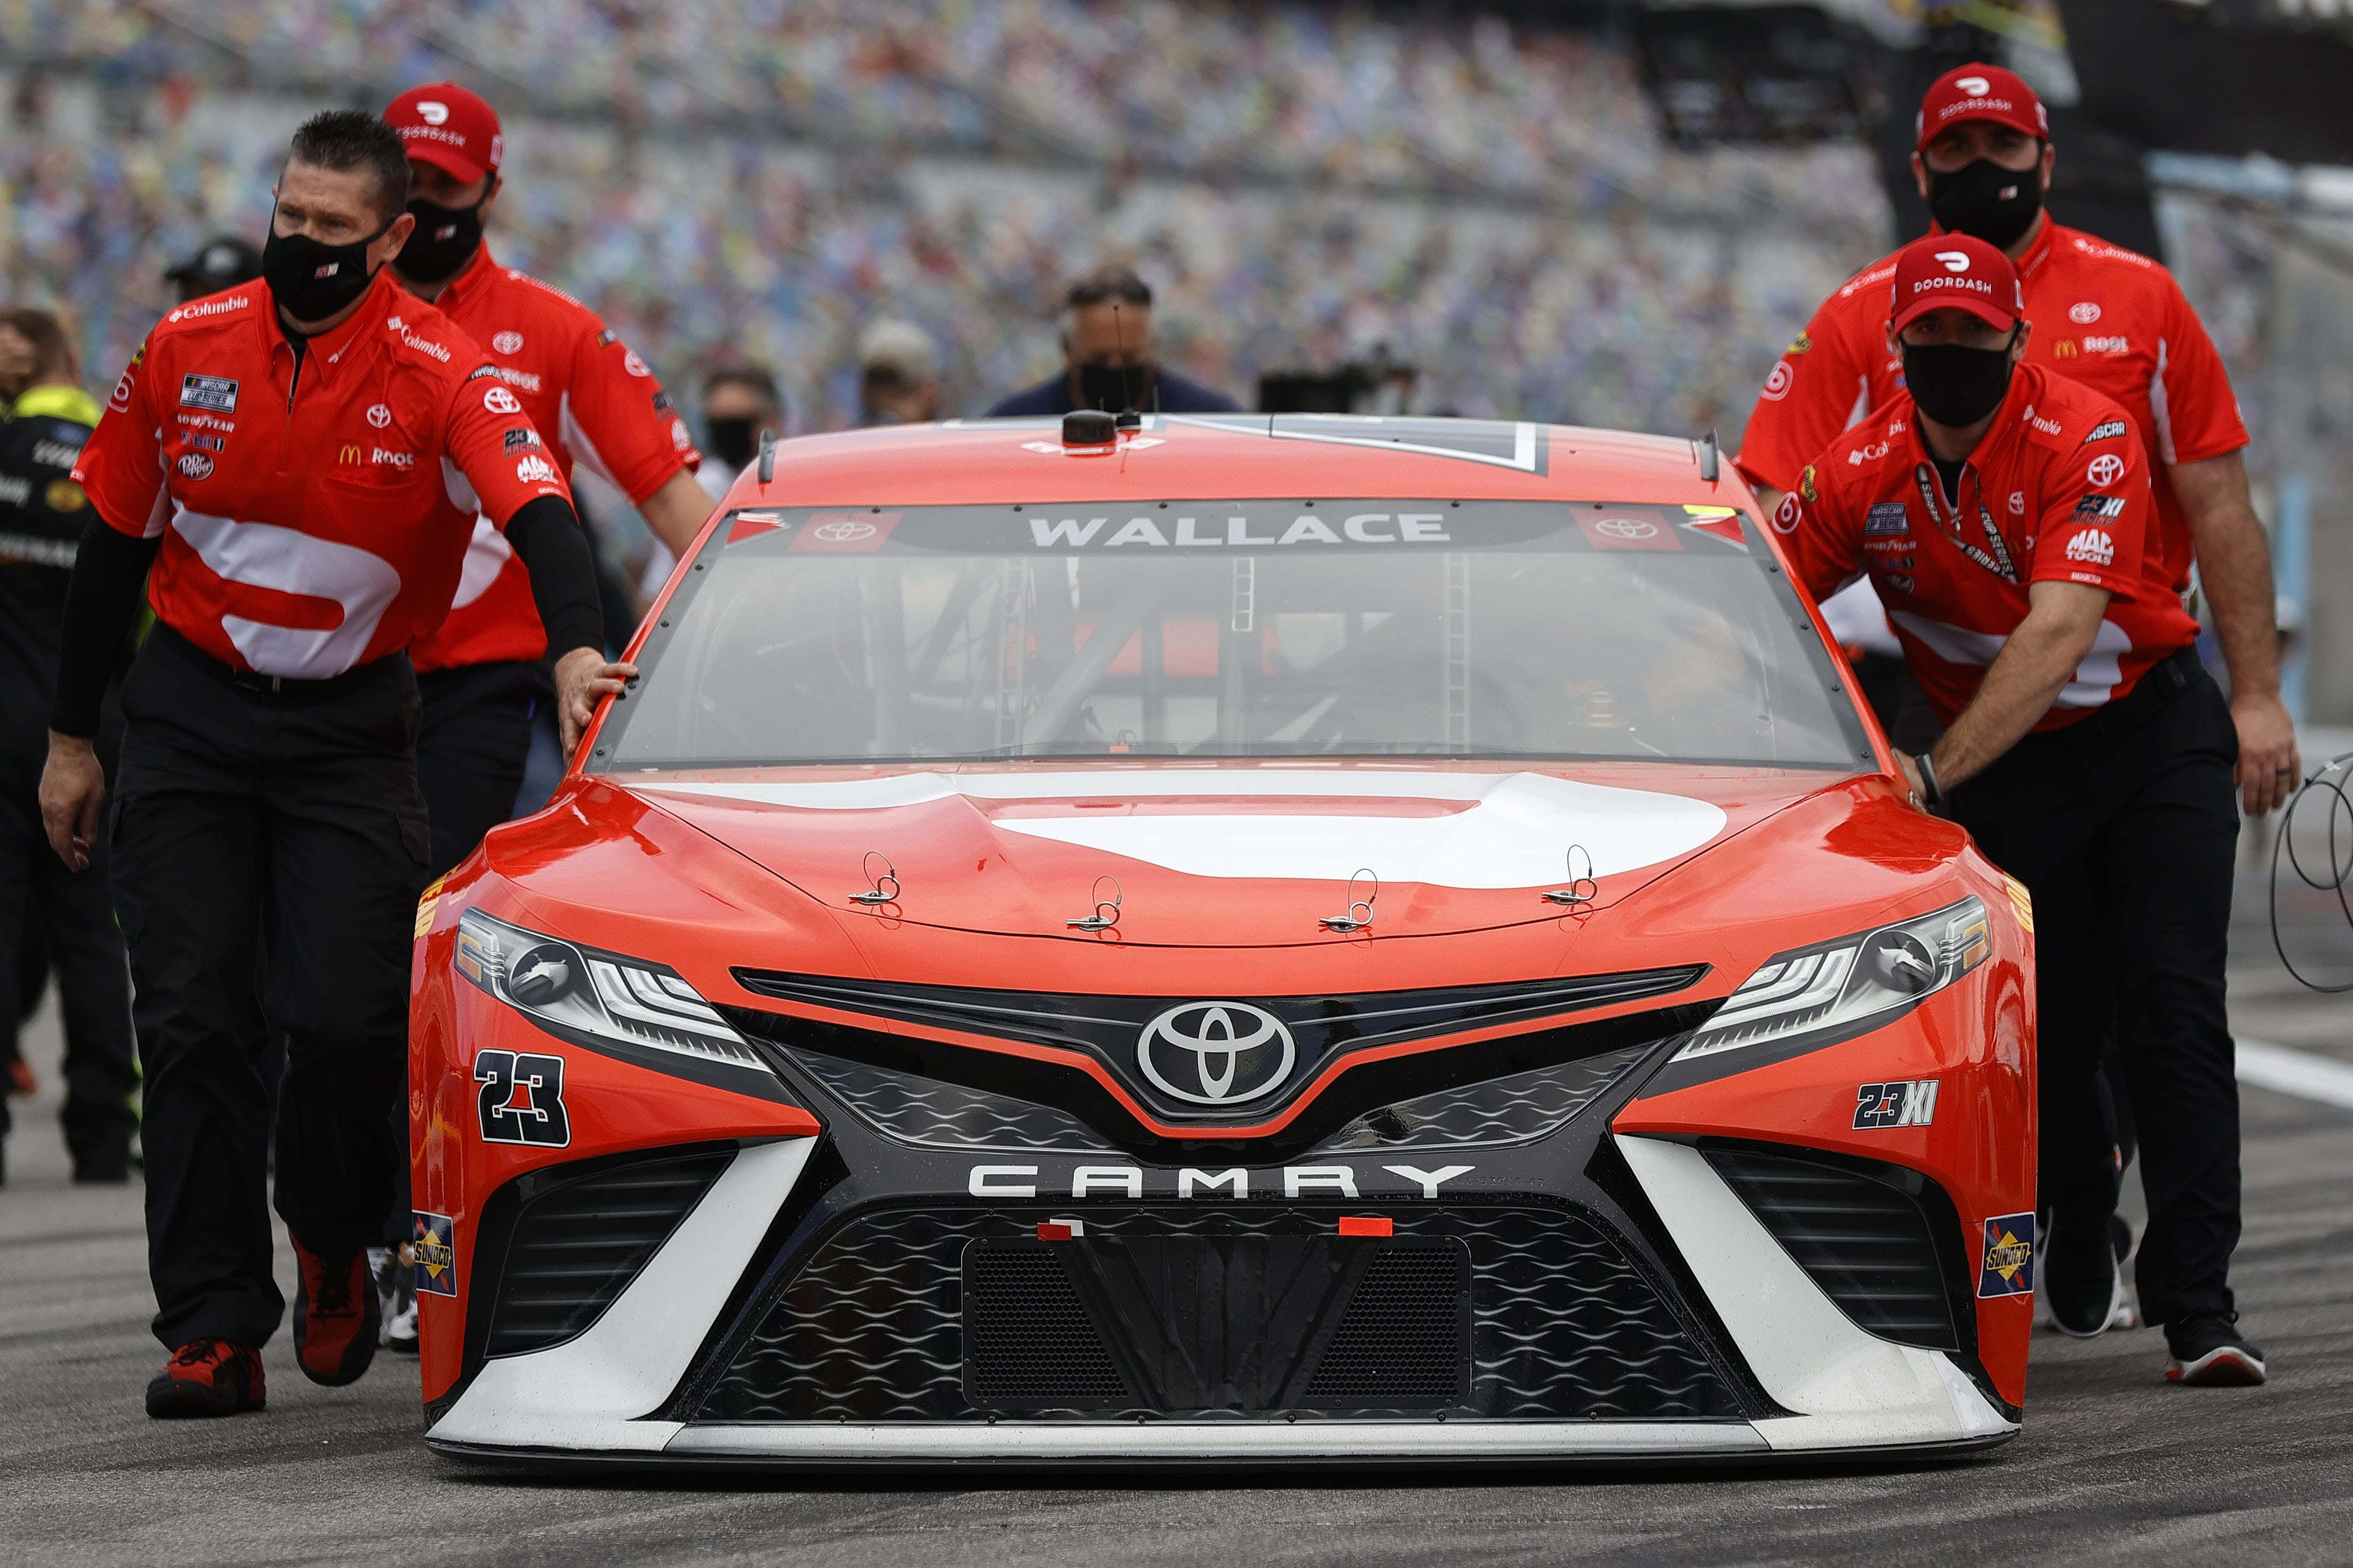 Bubba Wallace - 23XI Racing - Daytona International Speedway - NASCAR Cup Series